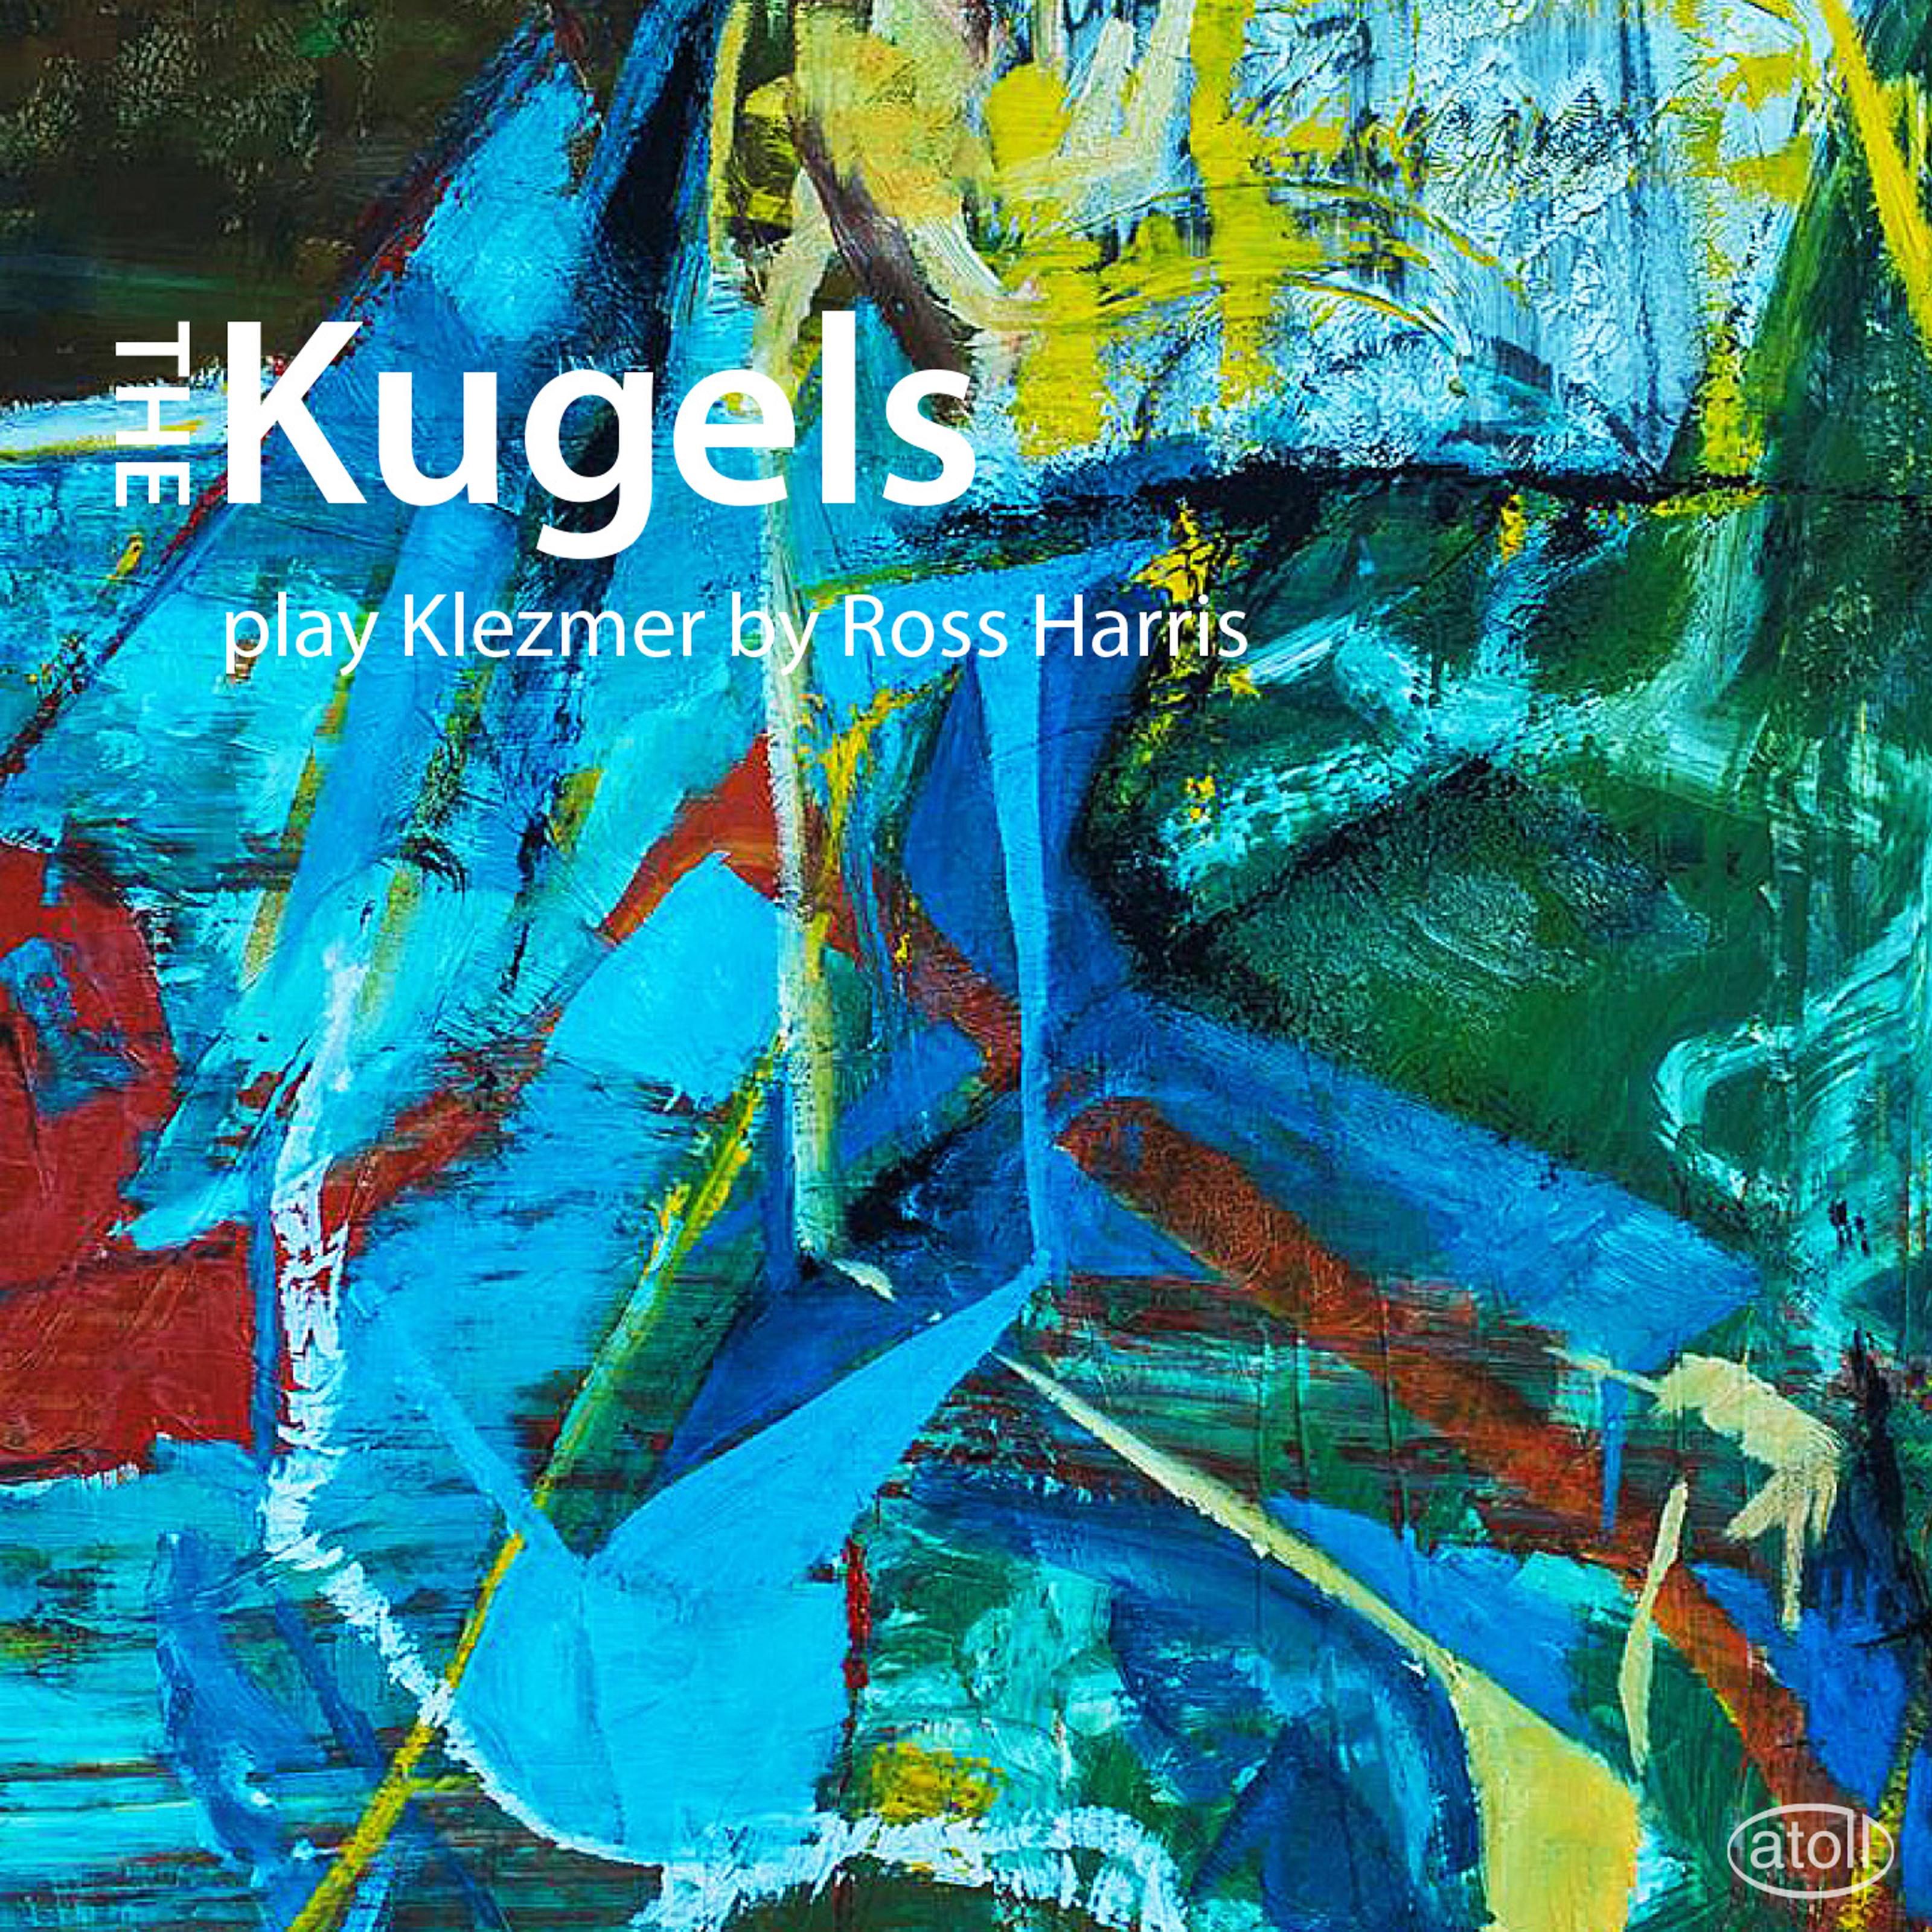 The Kugels Play Klezmer by Ross Harris